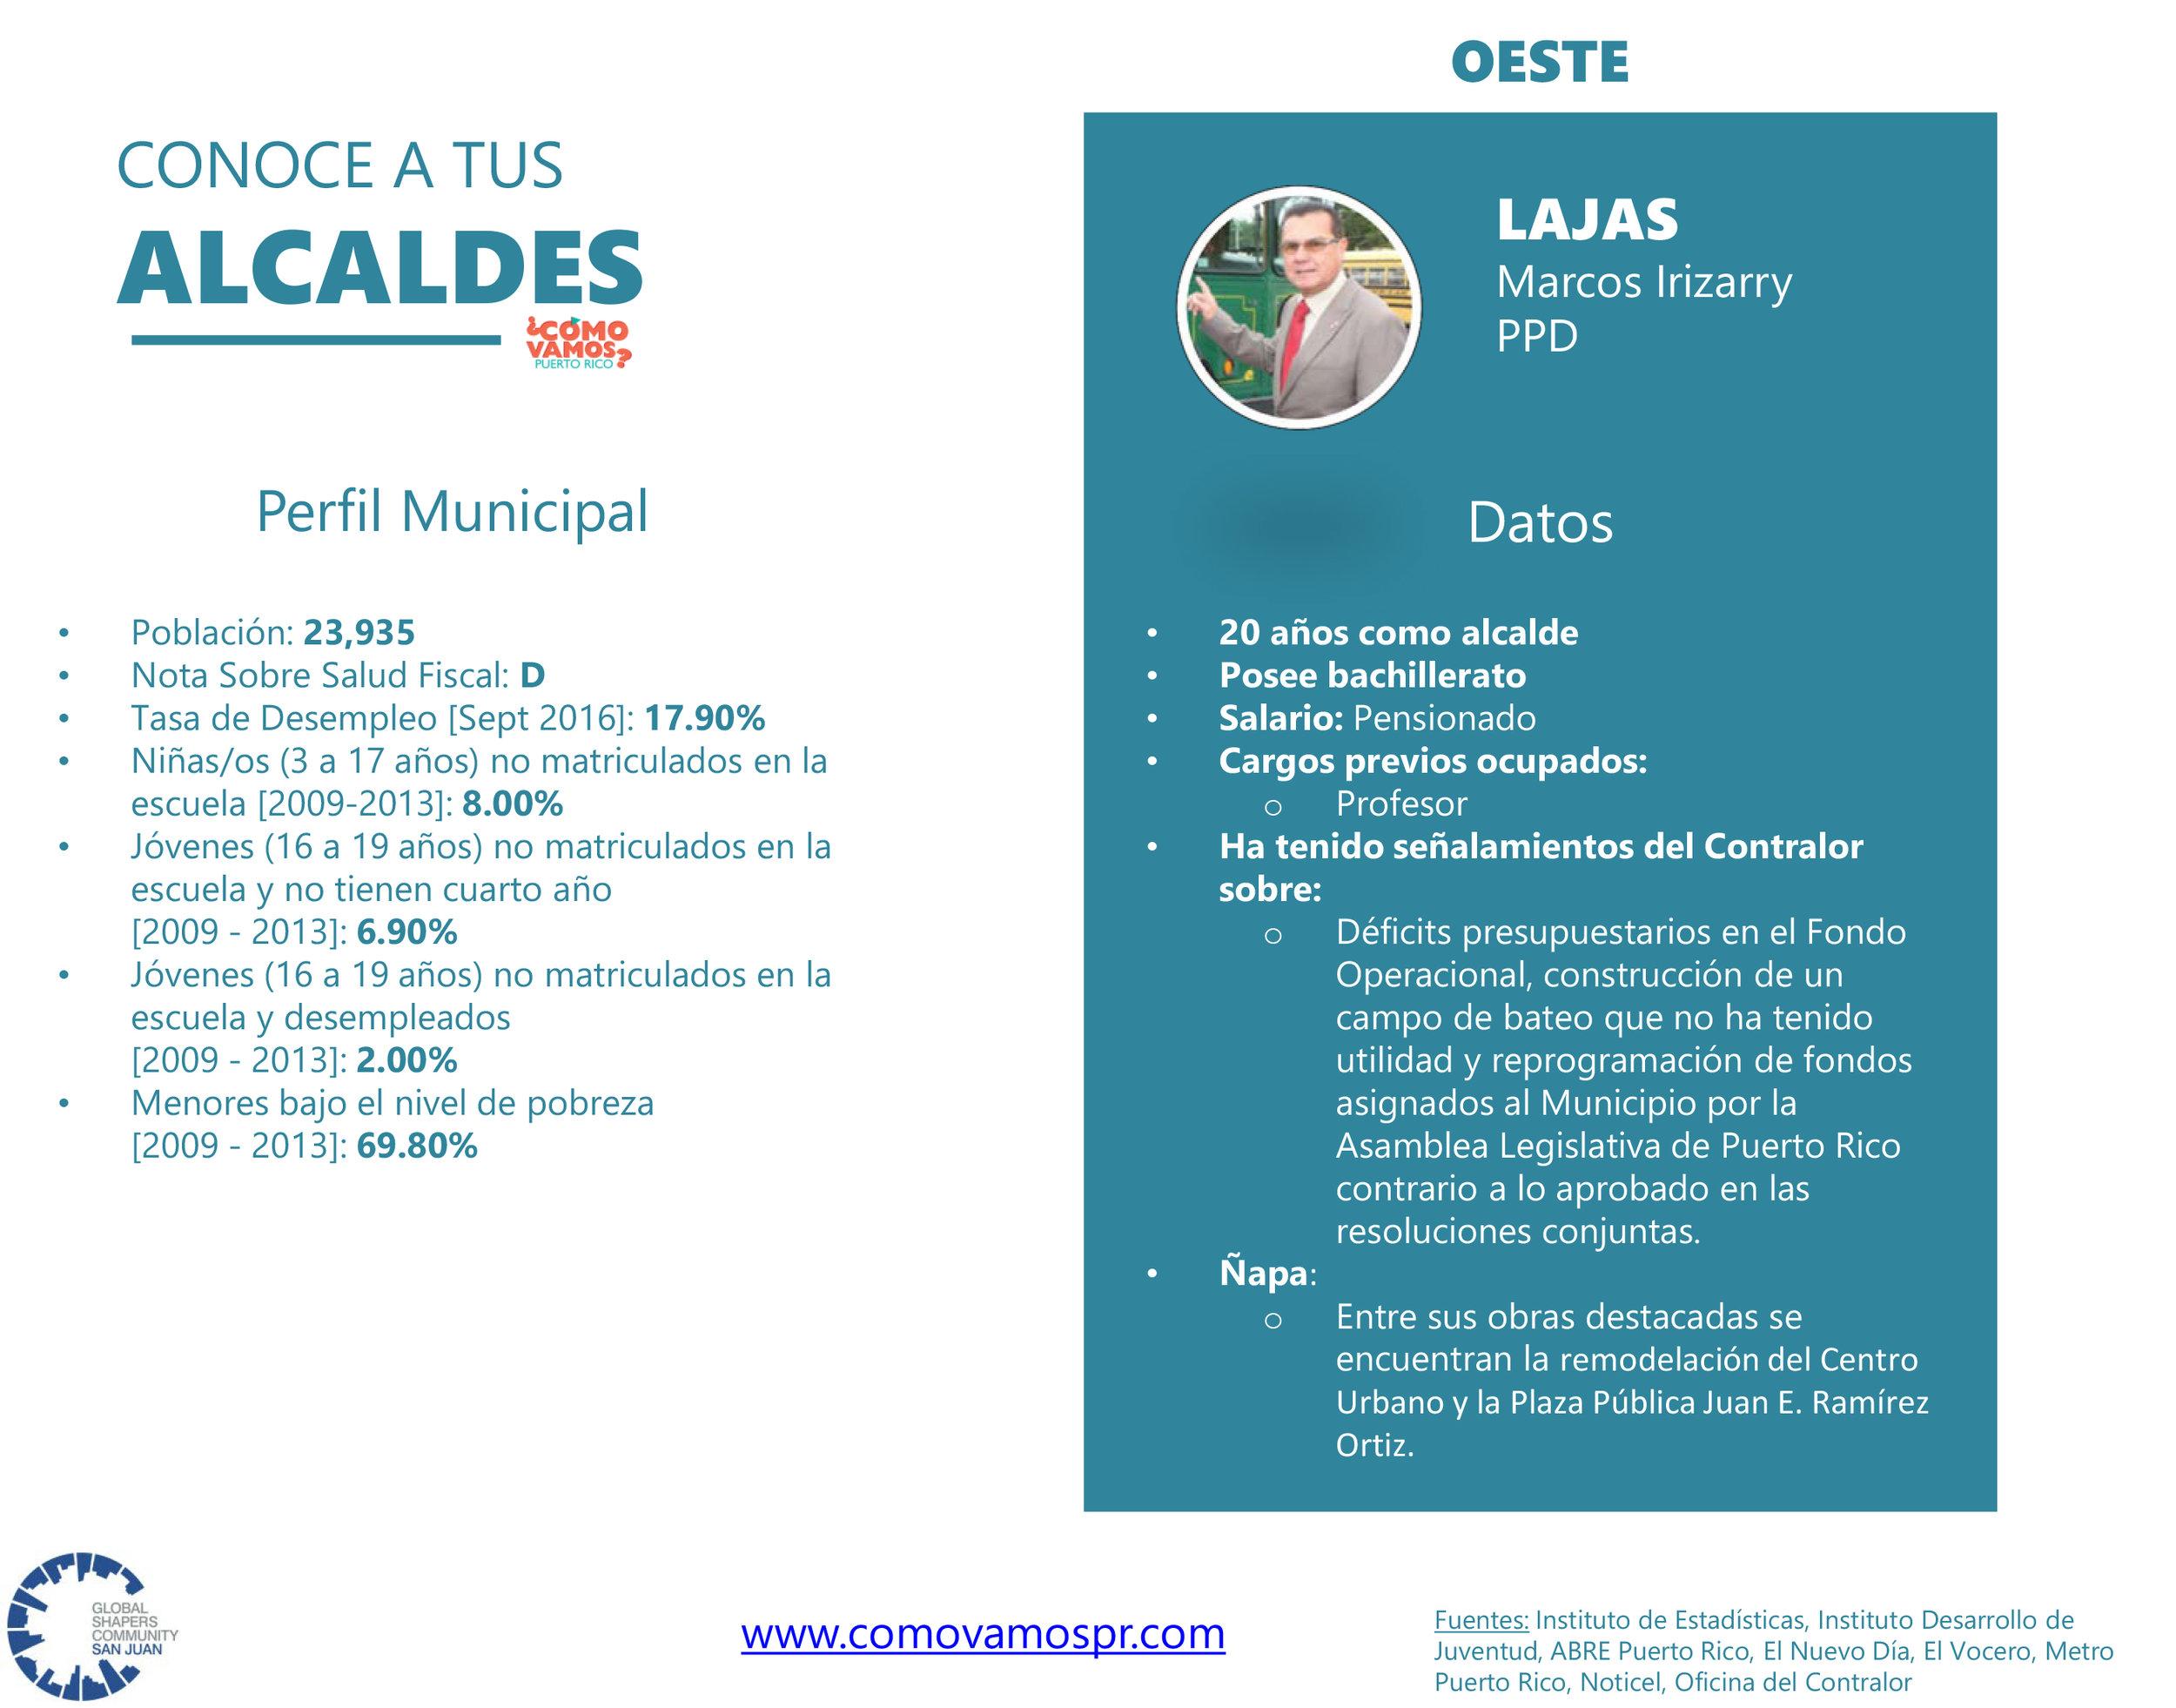 Alcaldes_Oeste_Lajas.jpg